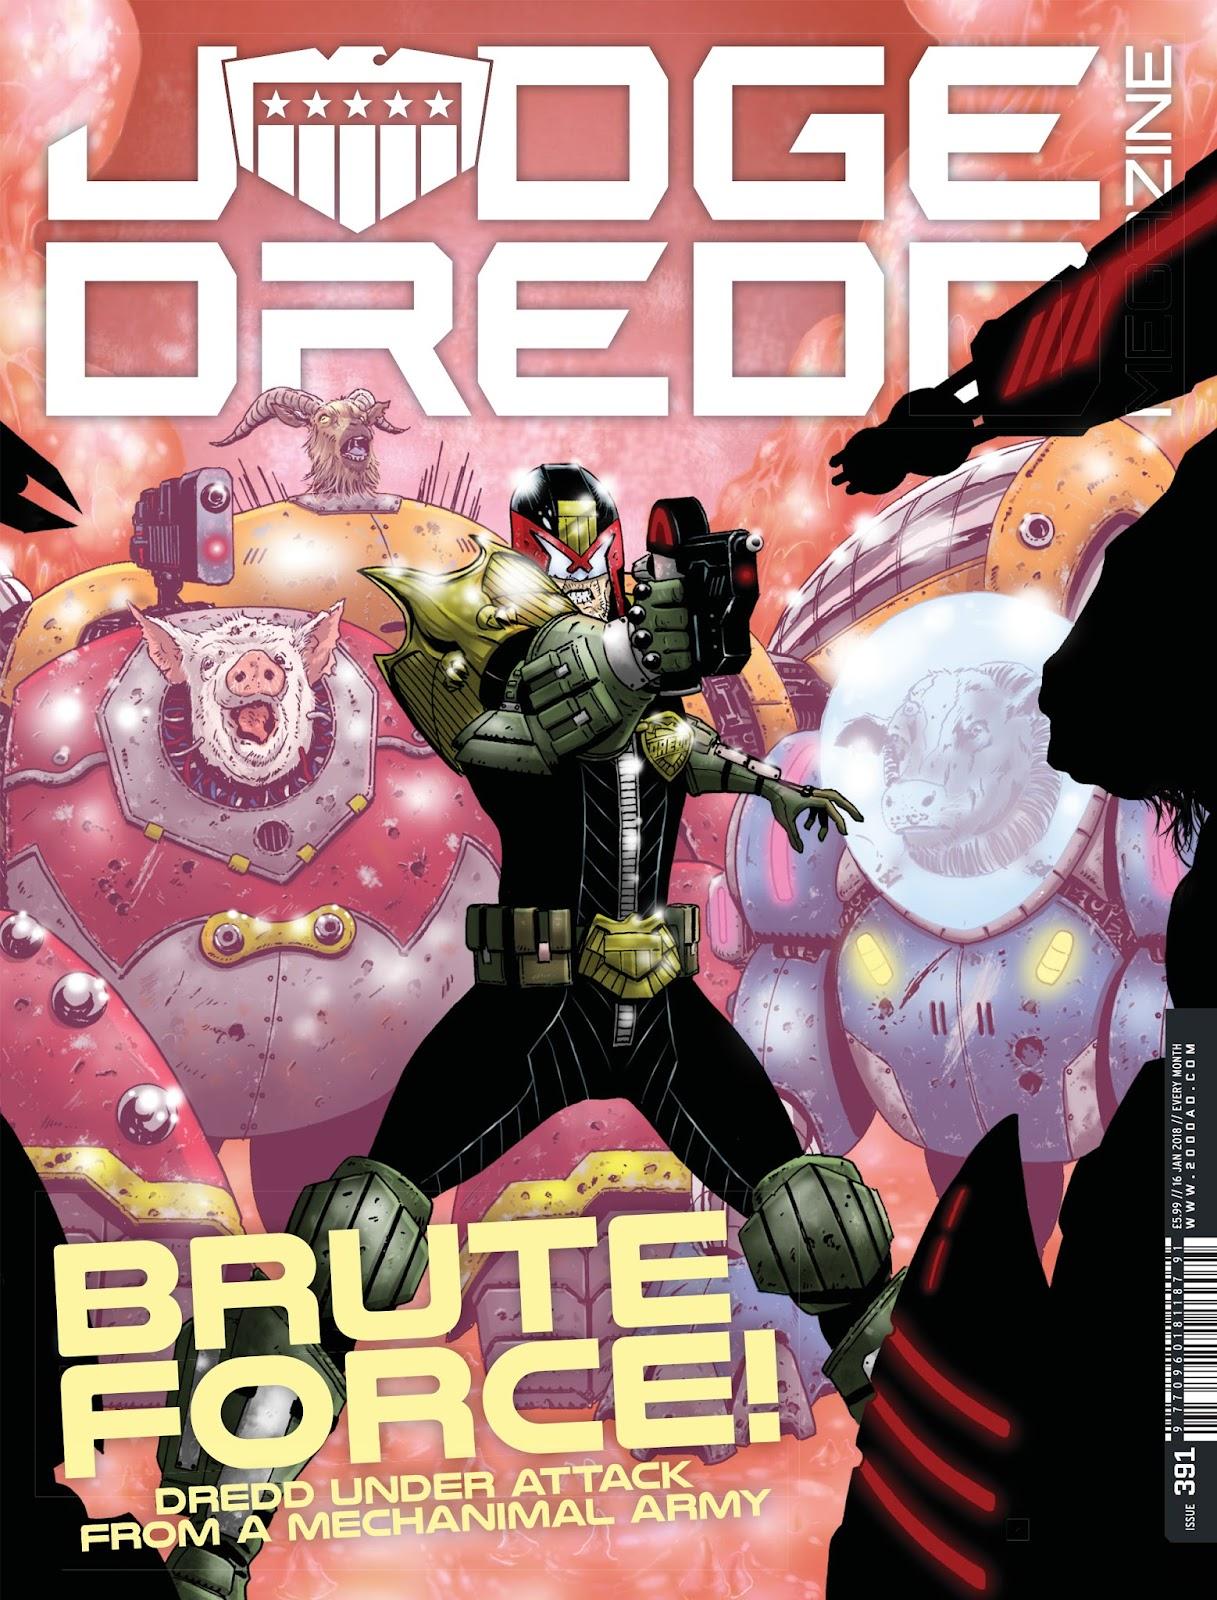 Judge Dredd Megazine (Vol. 5) issue 391 - Page 1